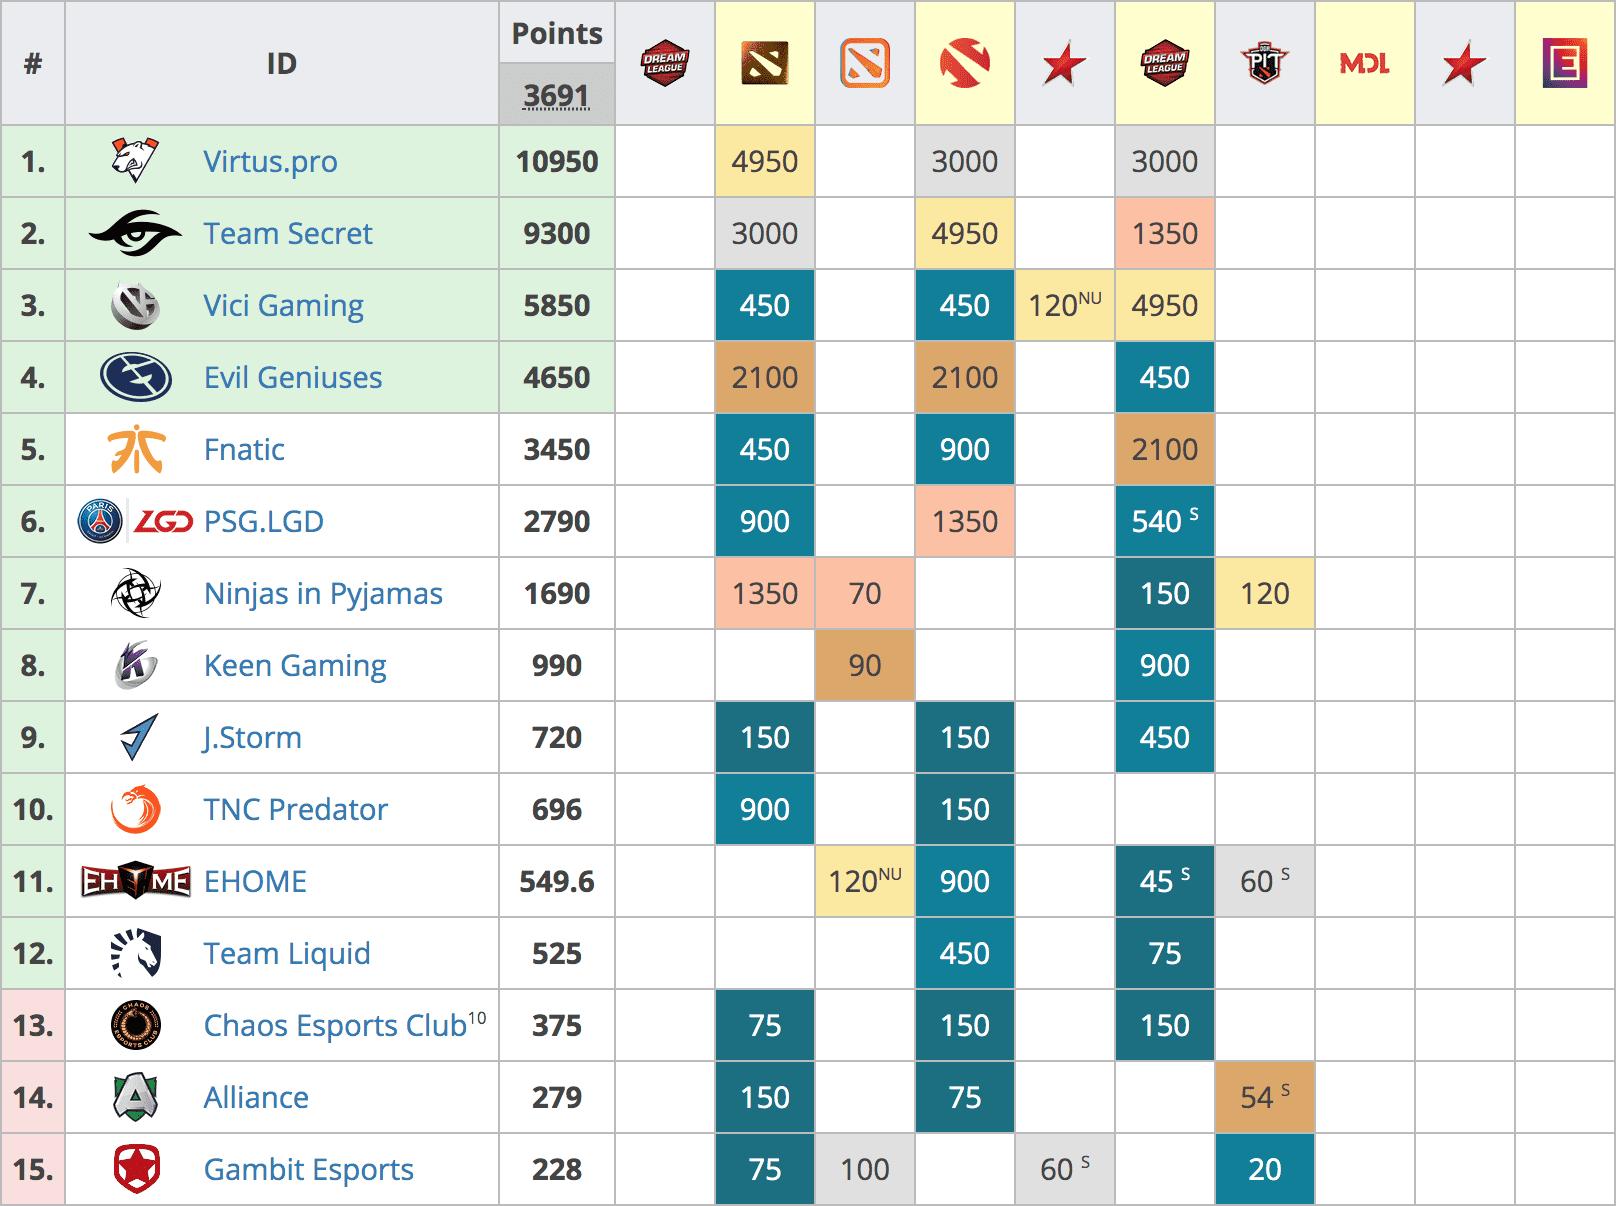 Dota 2 points table